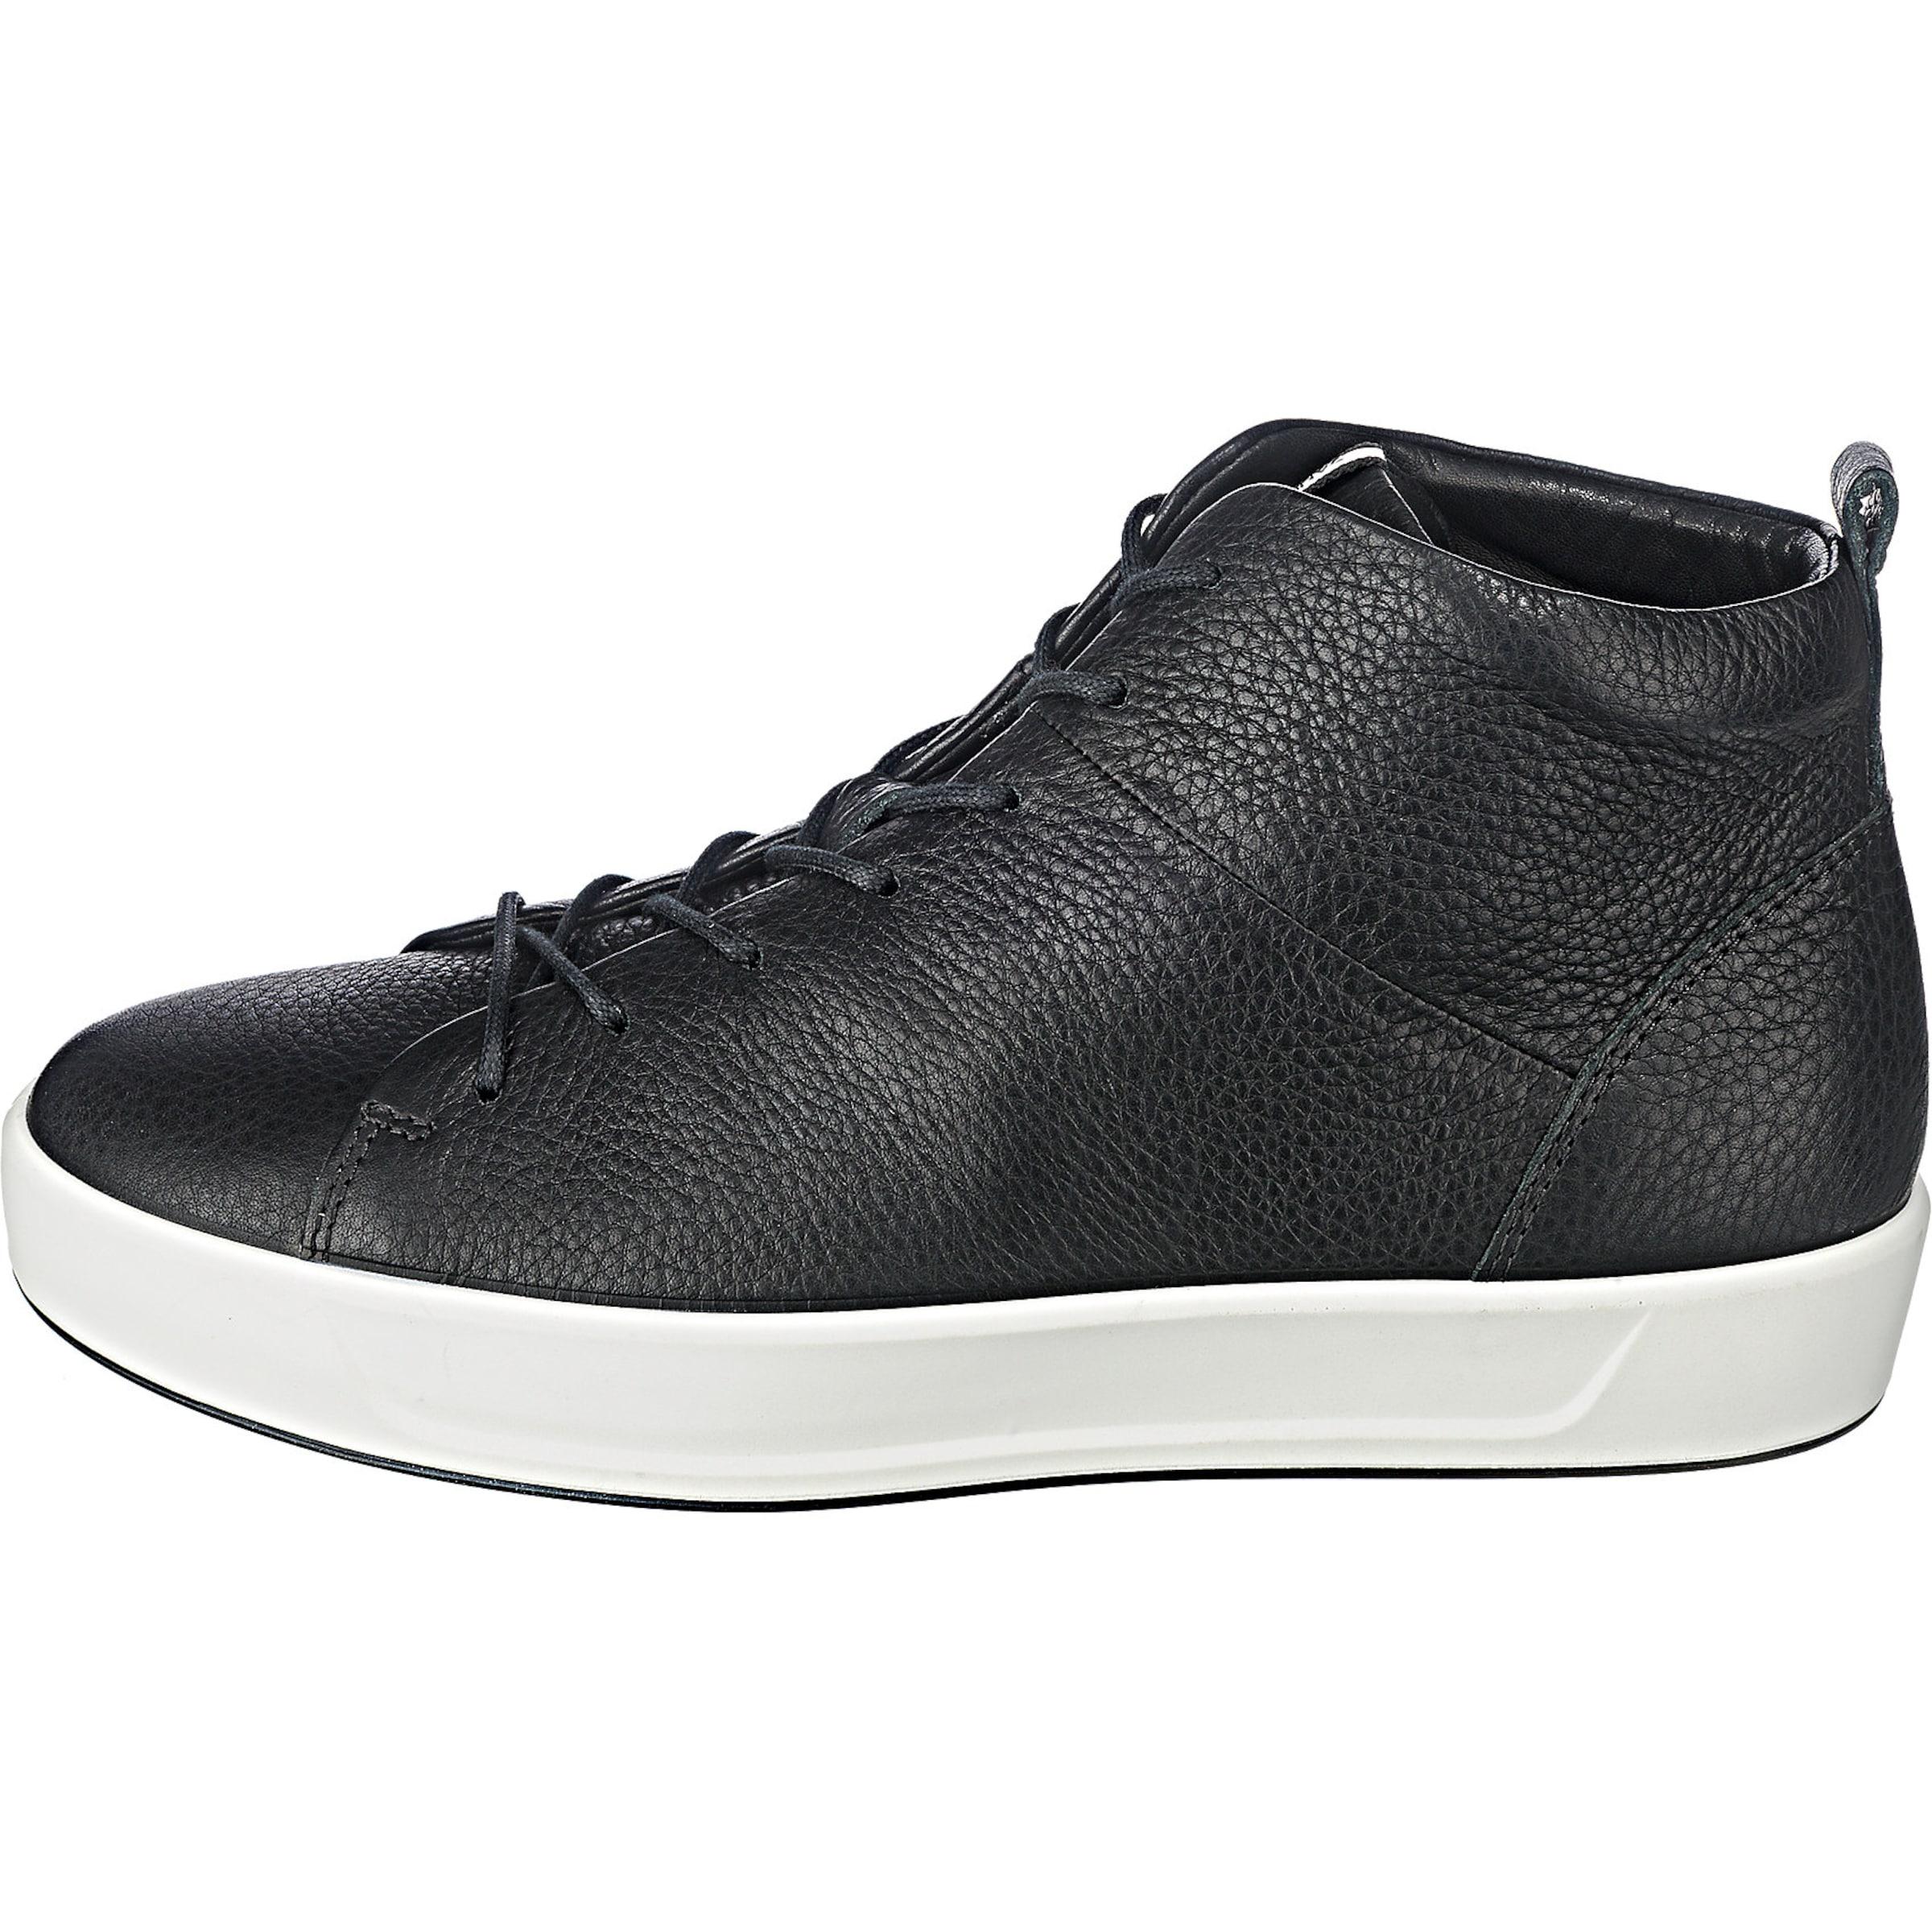 8' In Schwarz 'soft Ecco Sneakers 5L4jAR